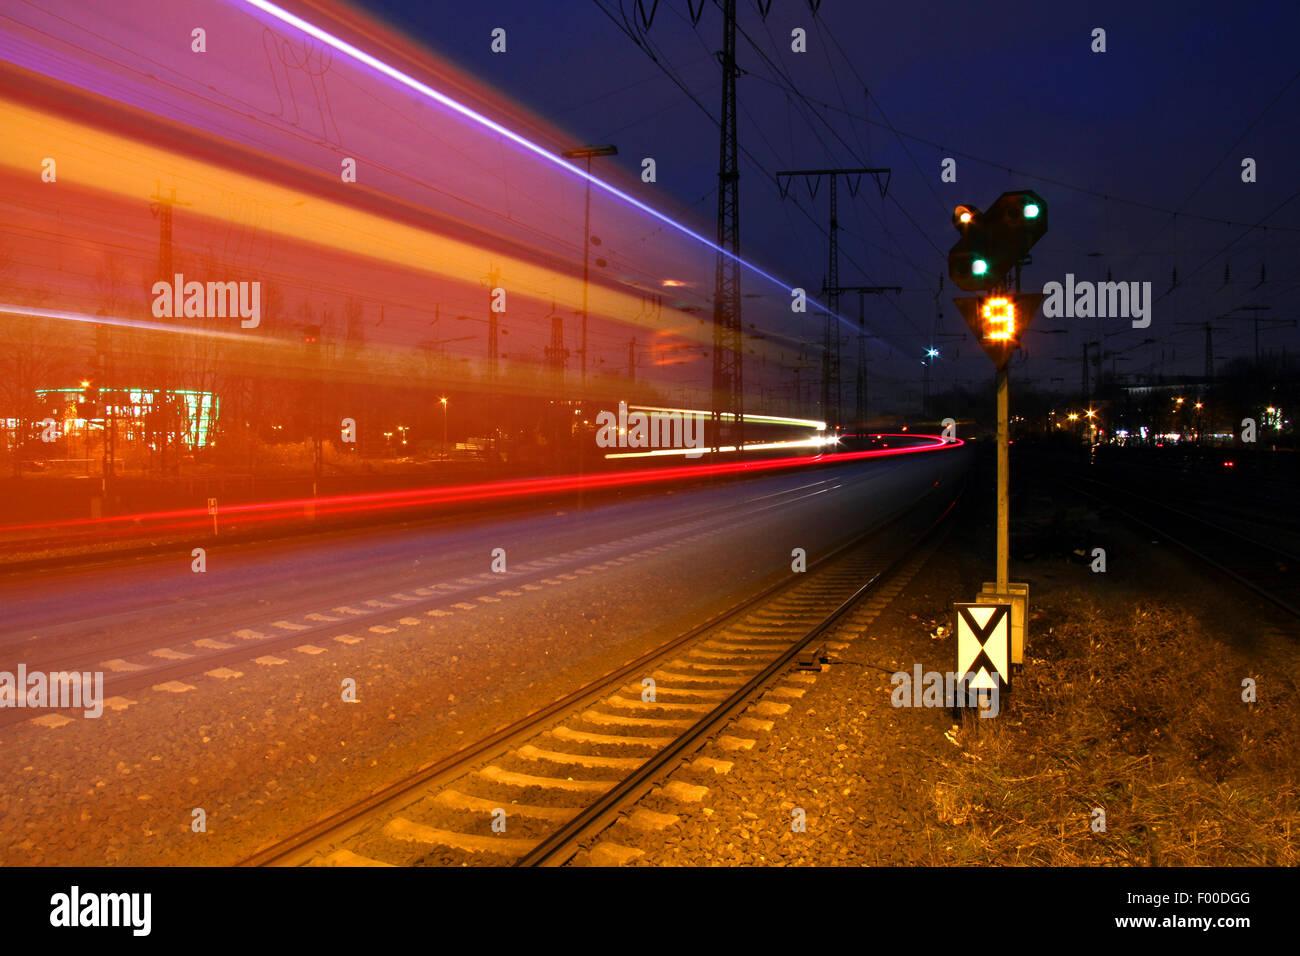 The train races through the dark night, Germany - Stock Image